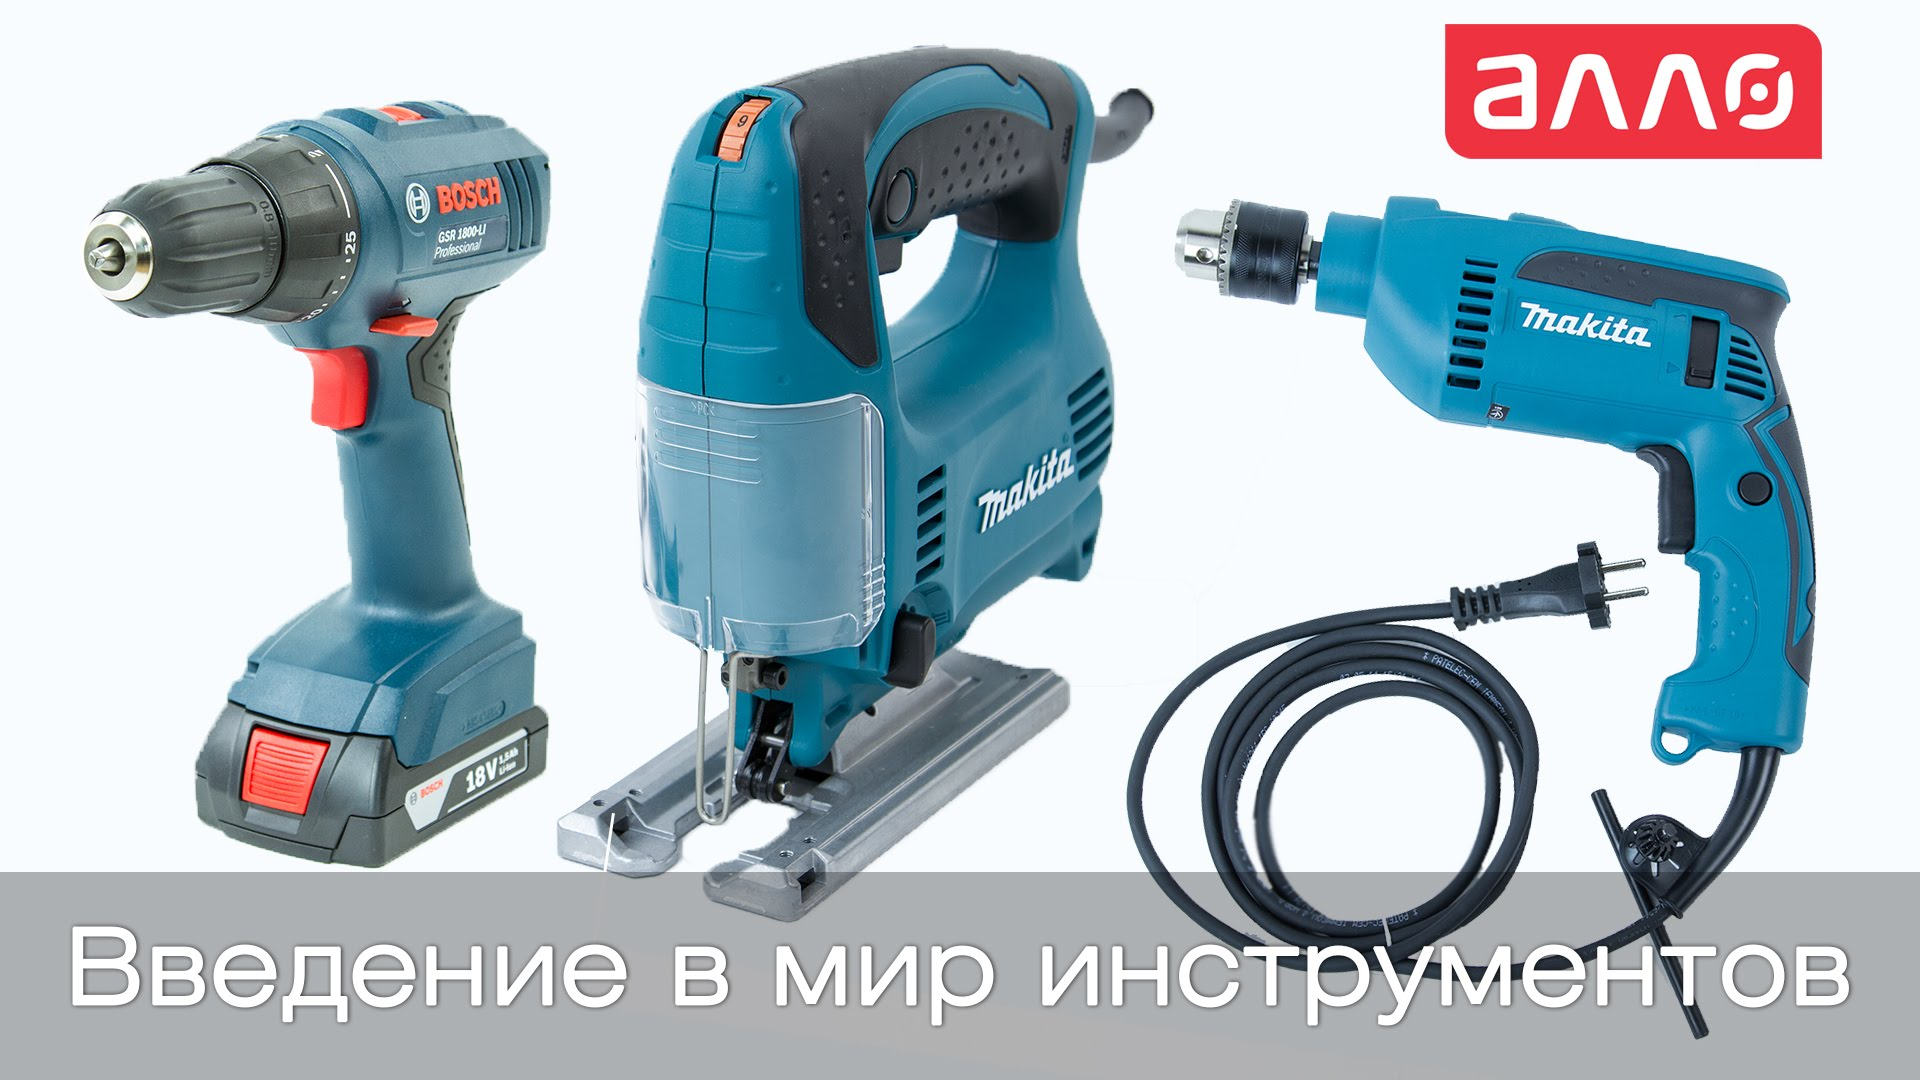 инструкция на электрорубанок rebir ie-5709m